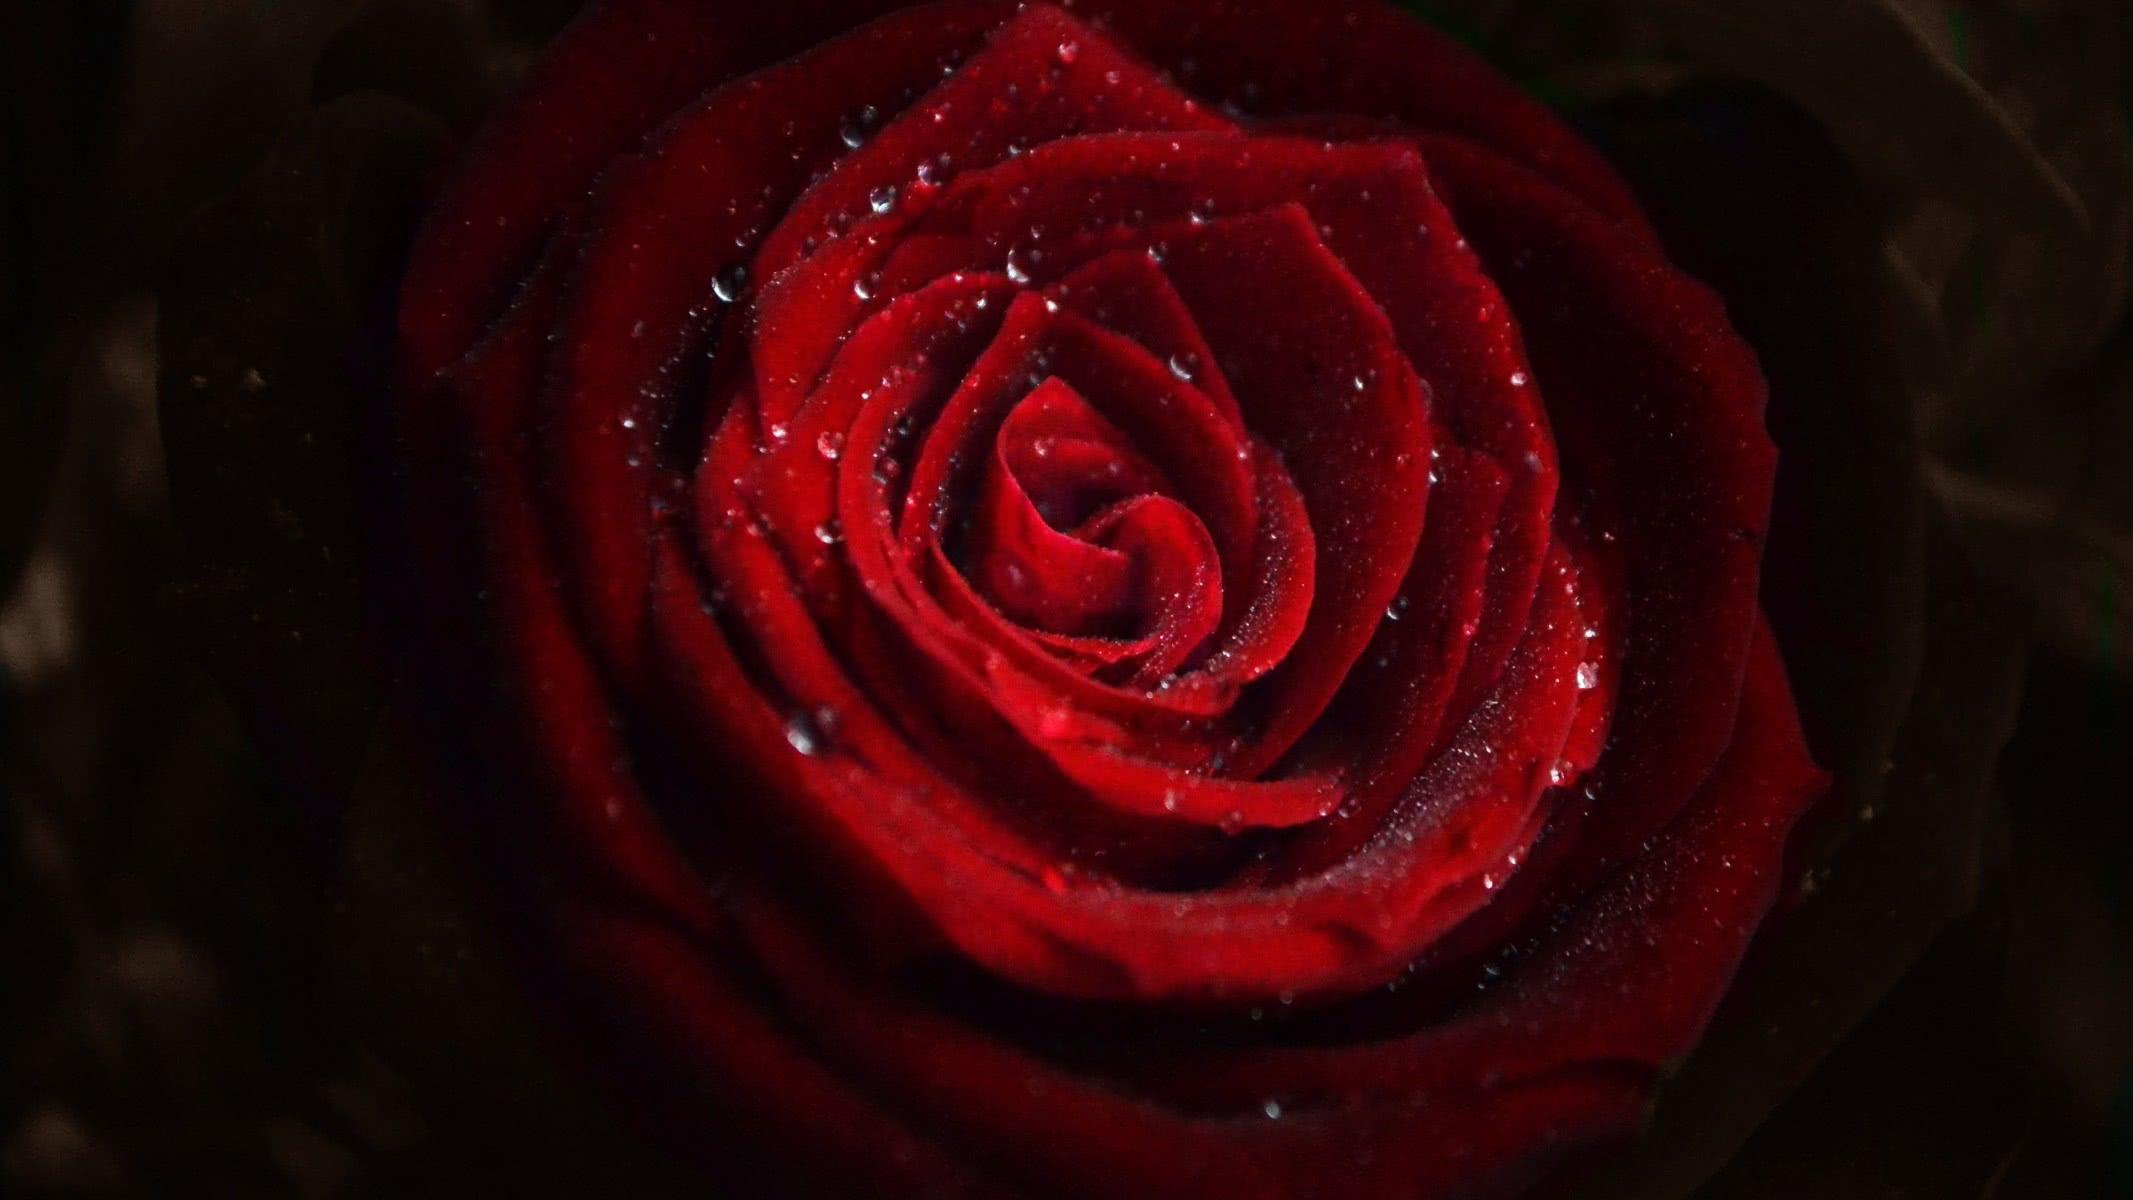 Rose Flower Water Drops - Rose Wallpaper Hd 4k , HD Wallpaper & Backgrounds